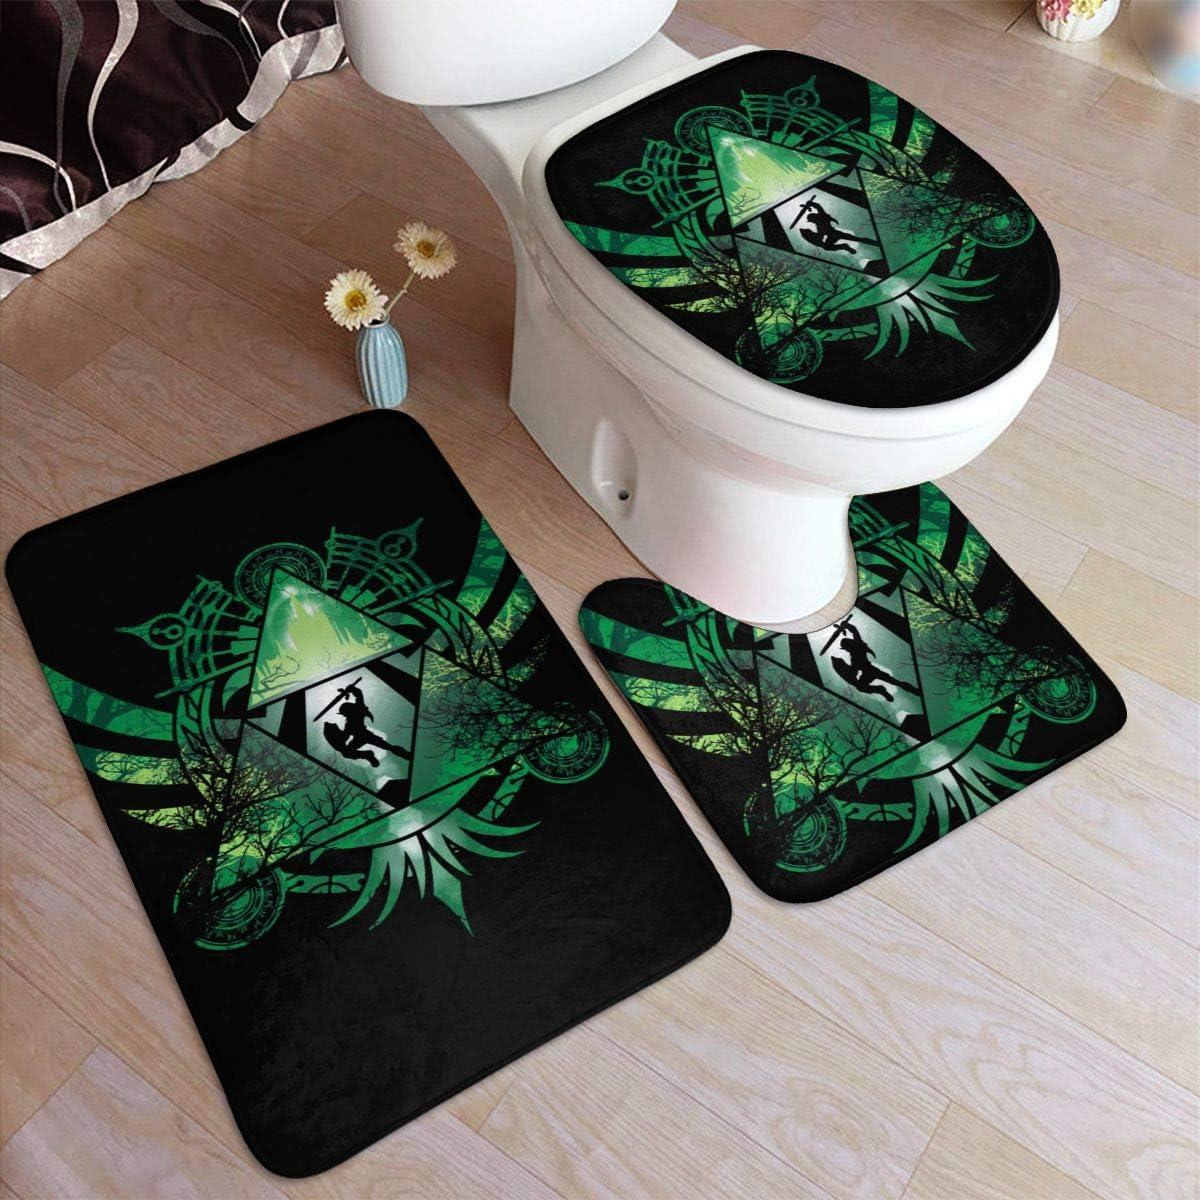 Amazon.com: SoContrerasnny The Legend of Zelda Bathroom Rug 9